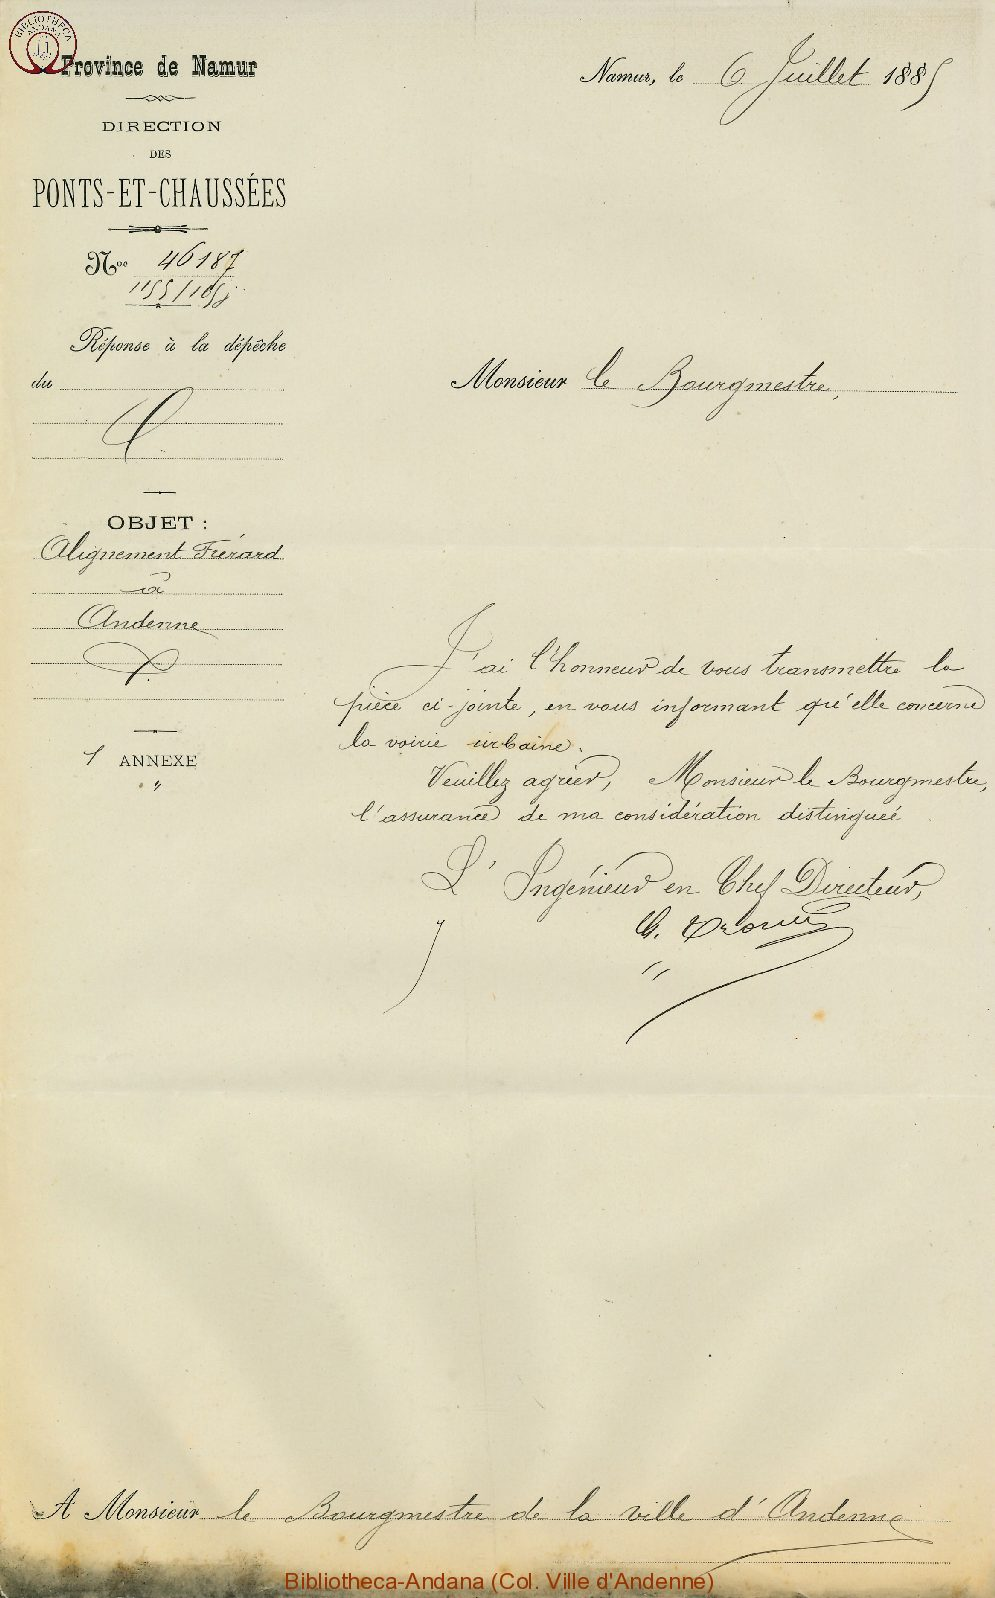 1885-07-06